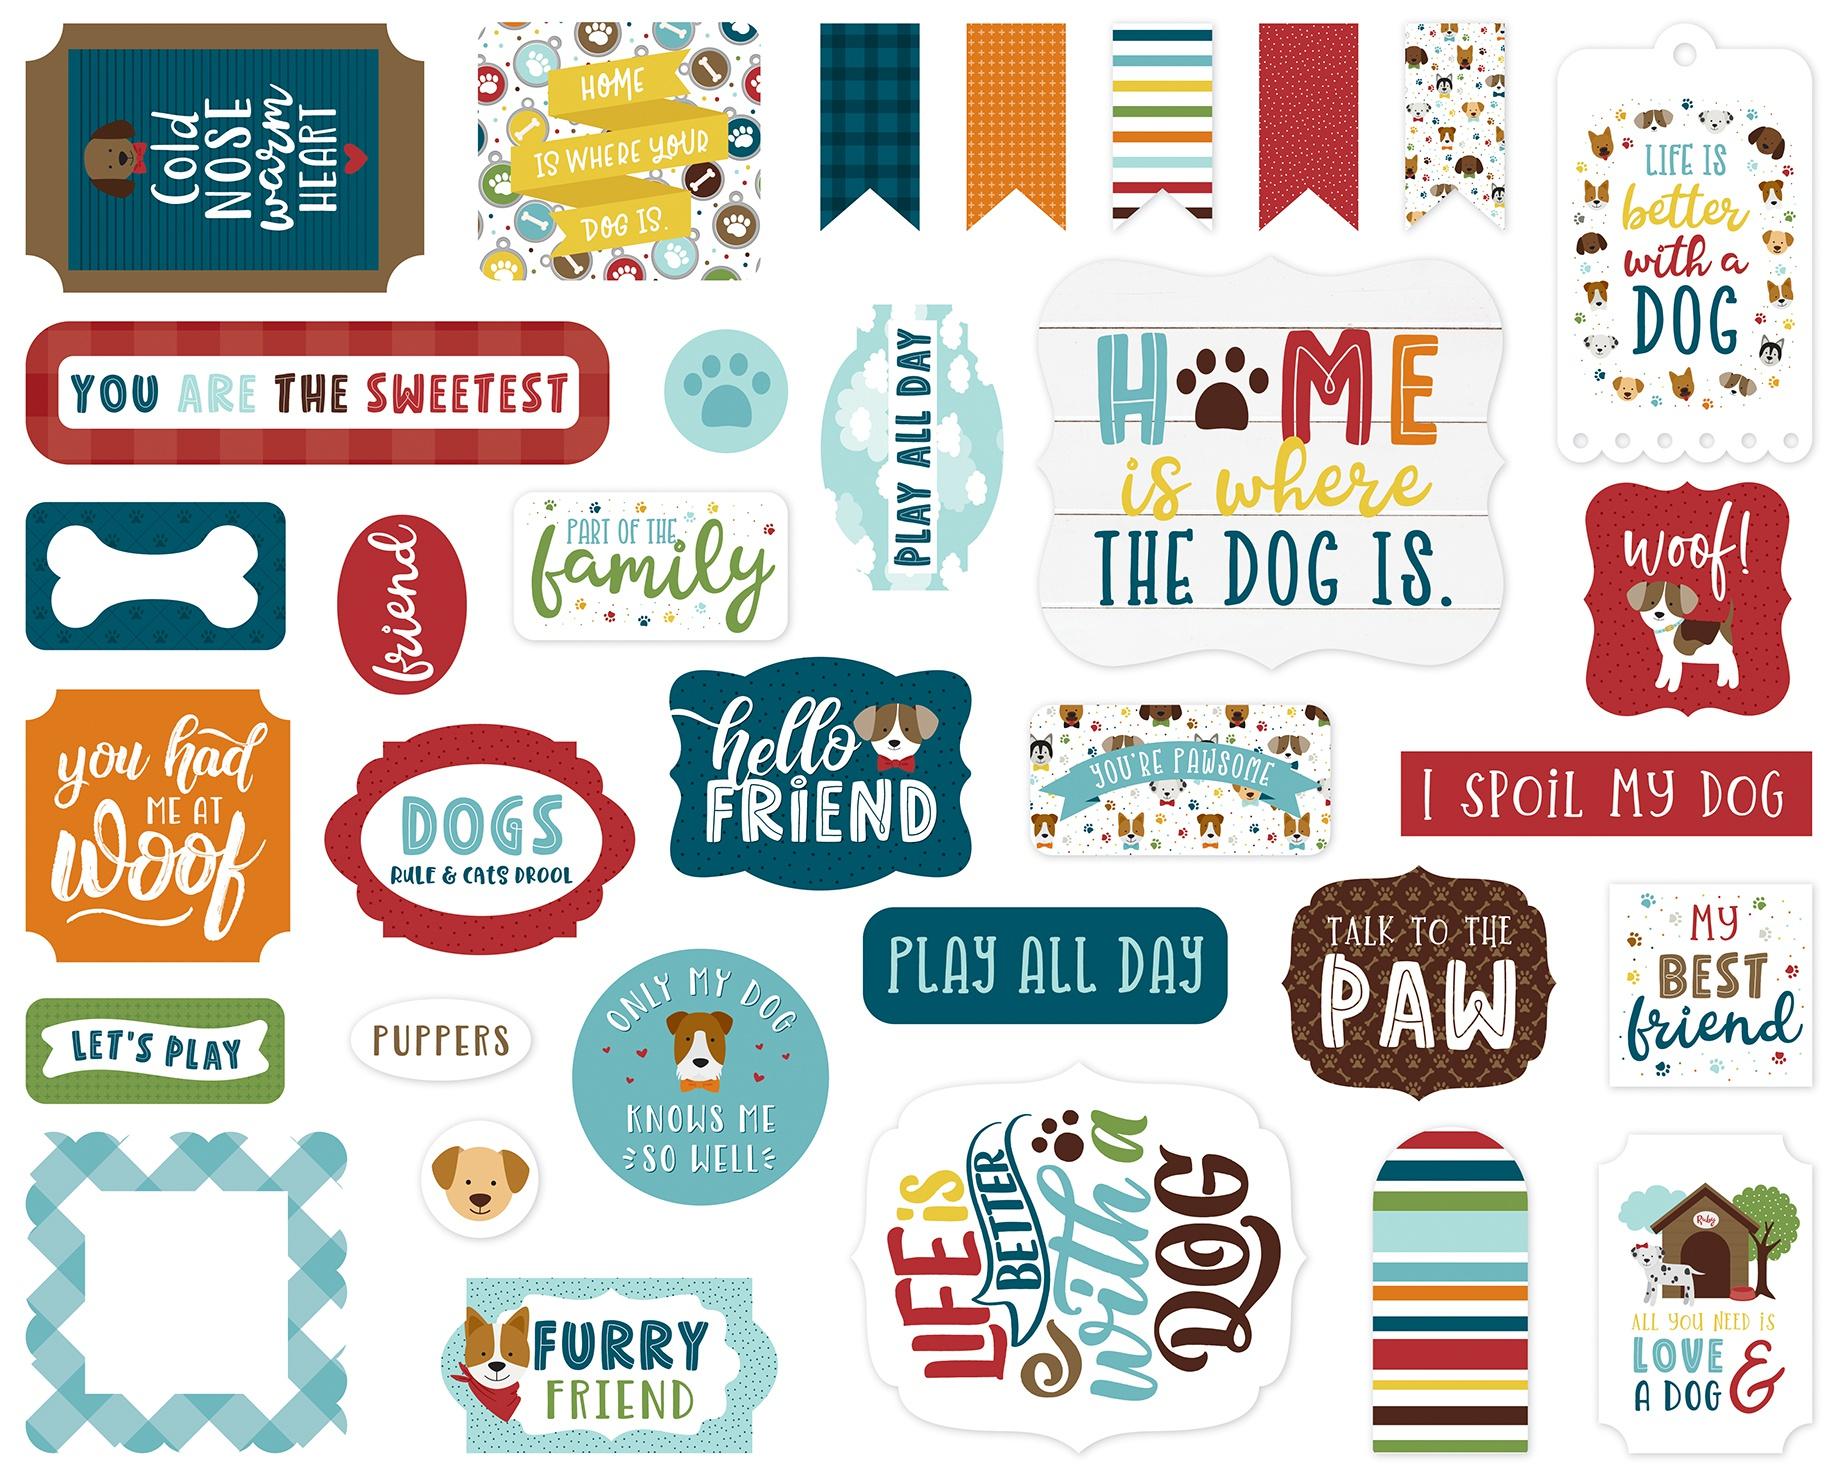 Echo Park Cardstock Ephemera 33/Pkg-Icons, My Dog